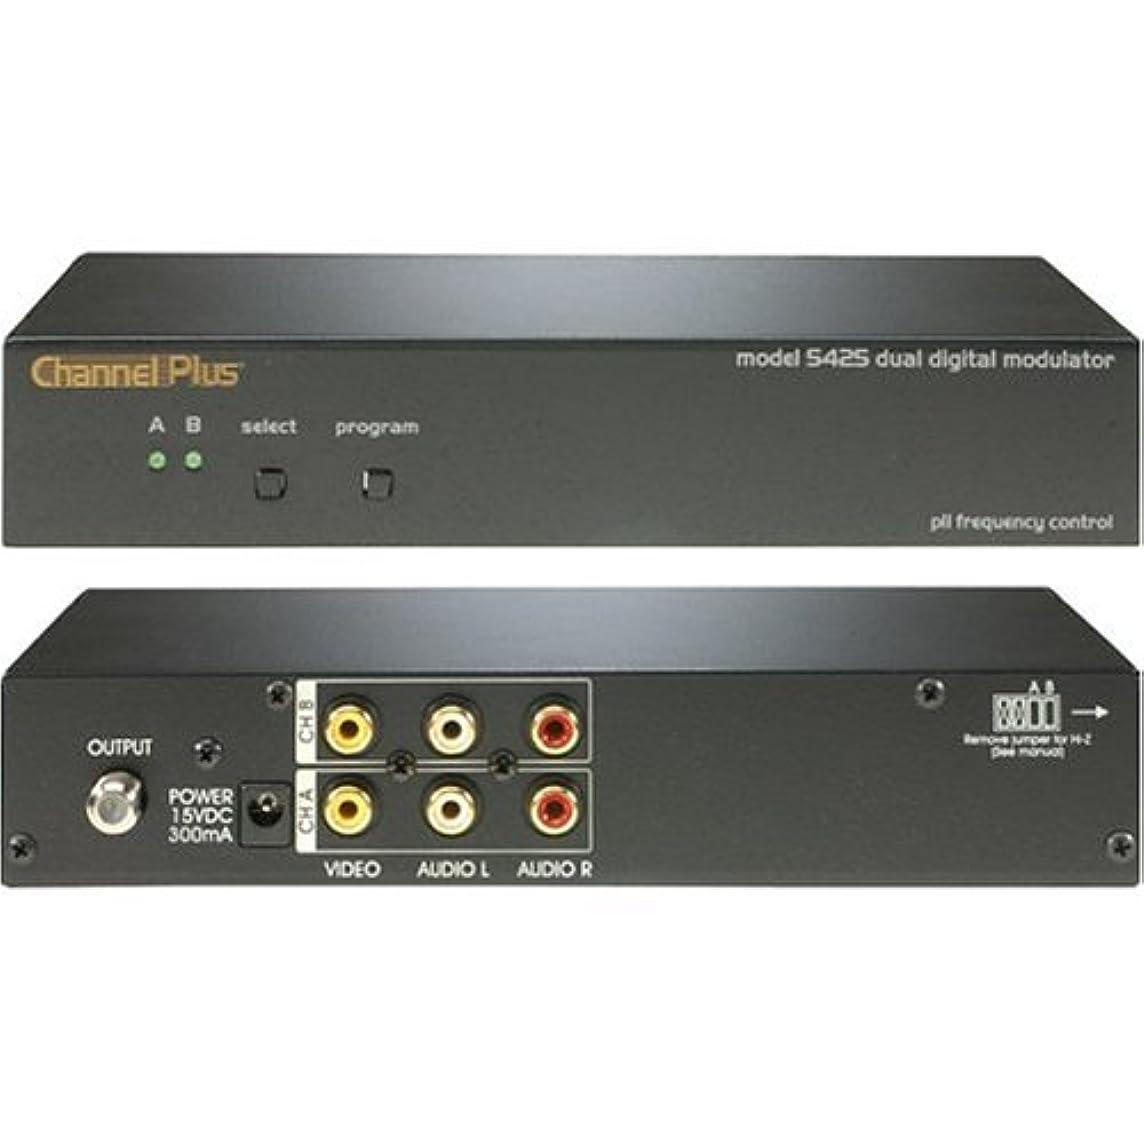 CHANNEL PLUS 5425 Dual Channel Rf Modulator